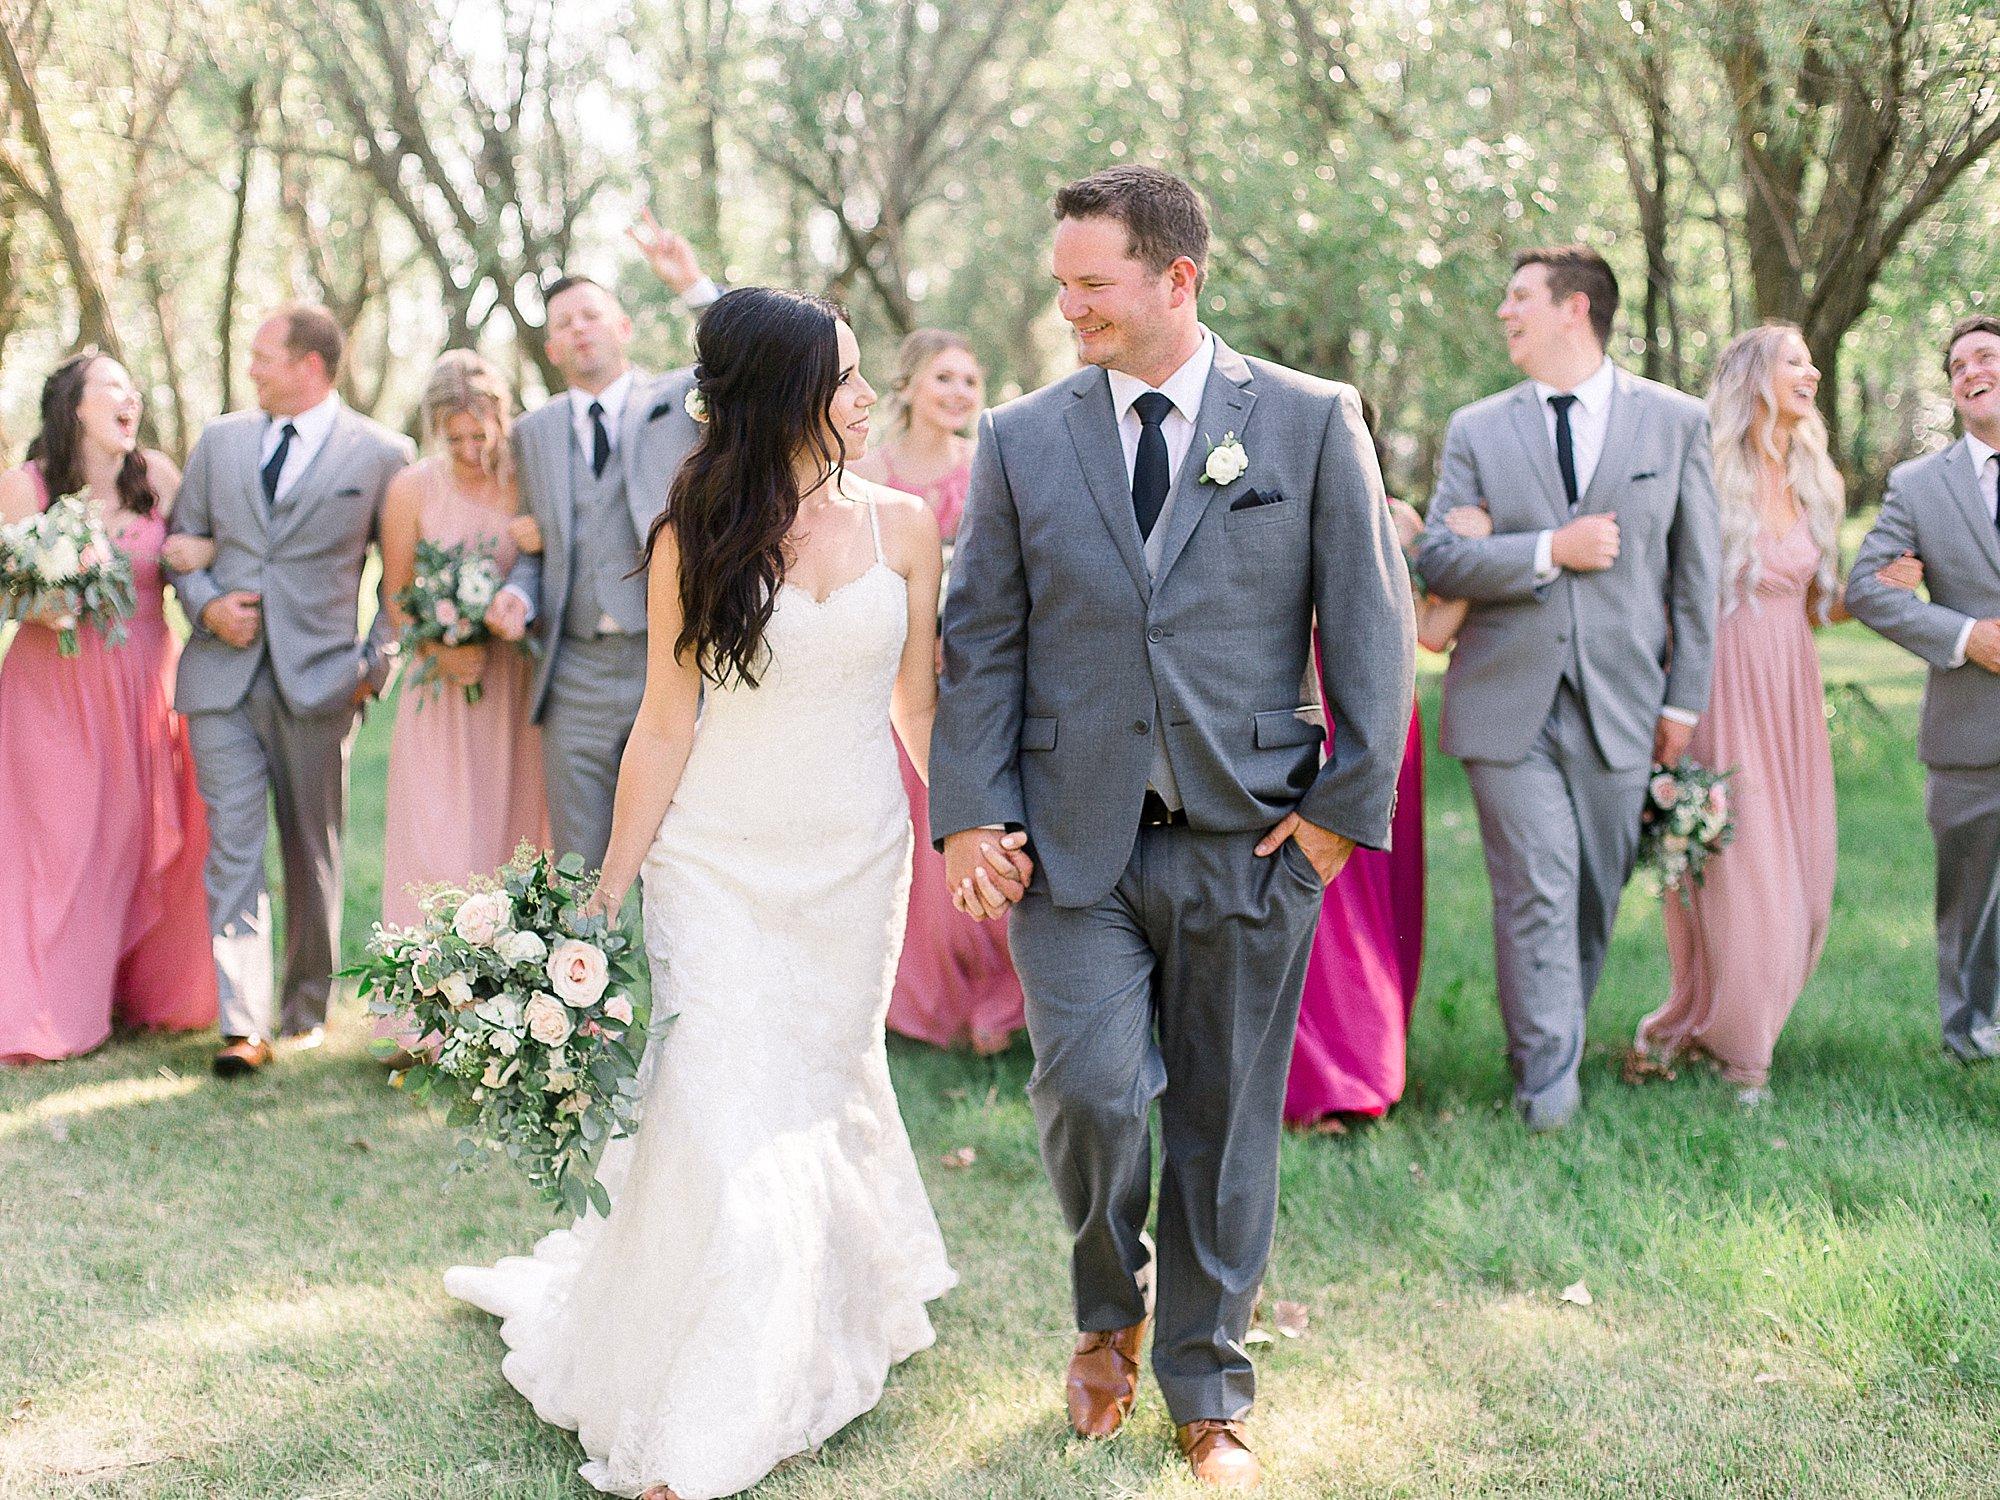 Jenna & Kyle | Backyard Manitoba Wedding